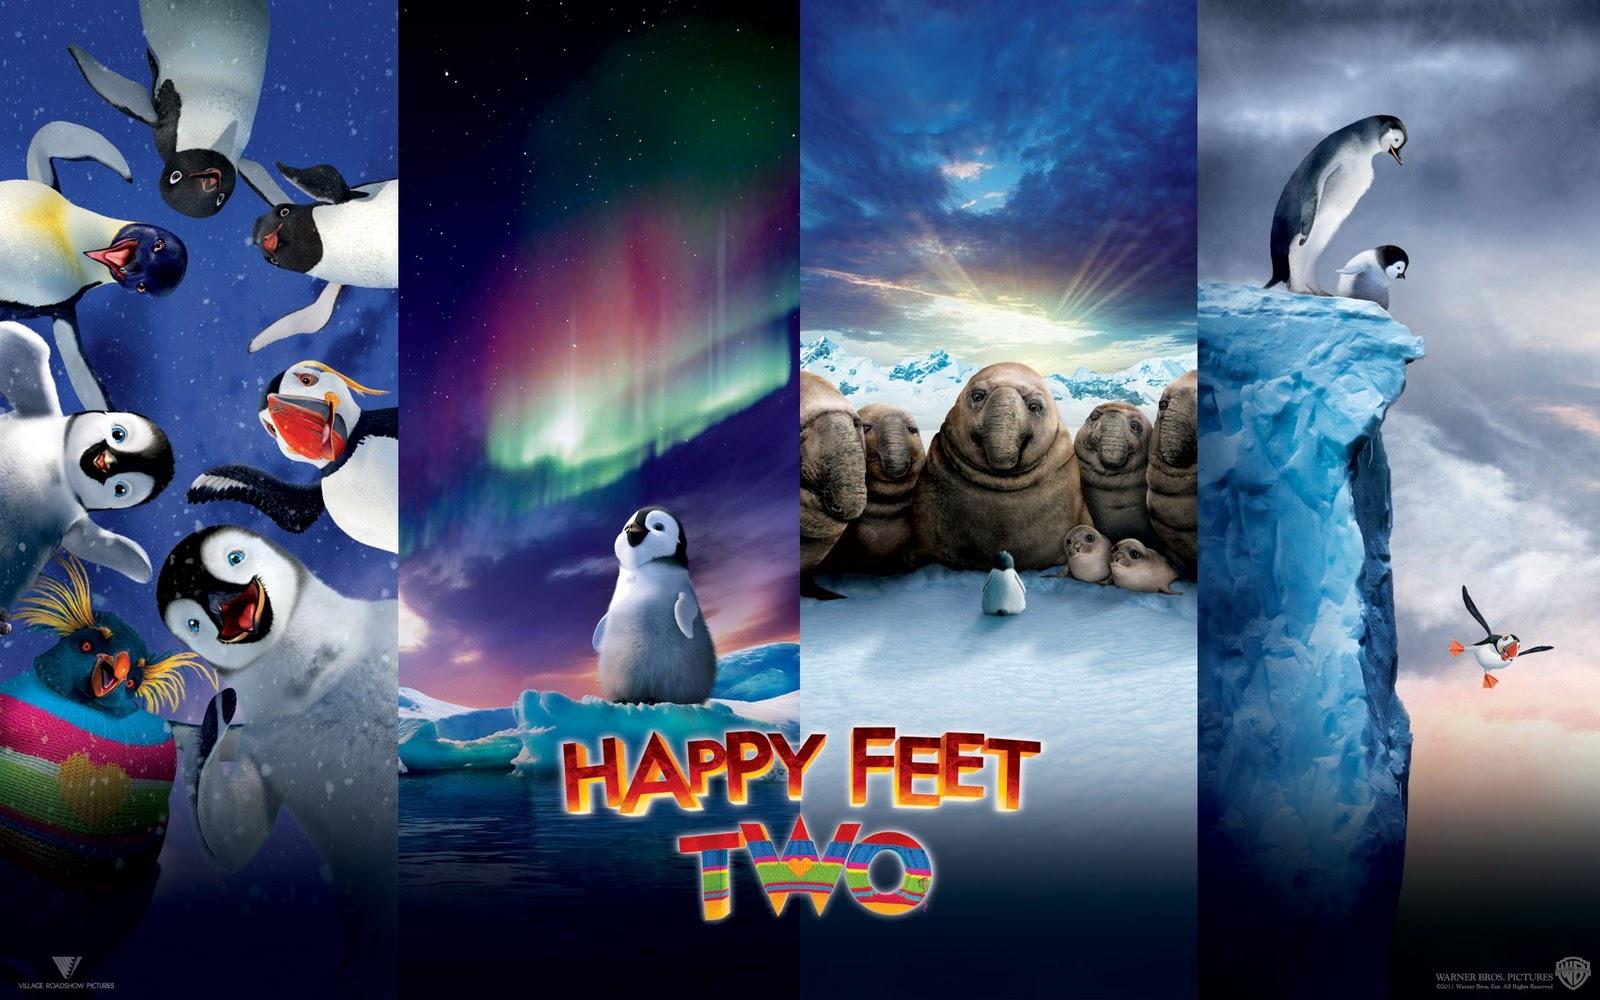 http://2.bp.blogspot.com/-BleqTnbUMfg/TxGLF-rOc9I/AAAAAAAAATY/B8ZTZv6A8gE/s1600/Happy_Feet_2_Characters_Poster_HD_Wallpaper.jpg